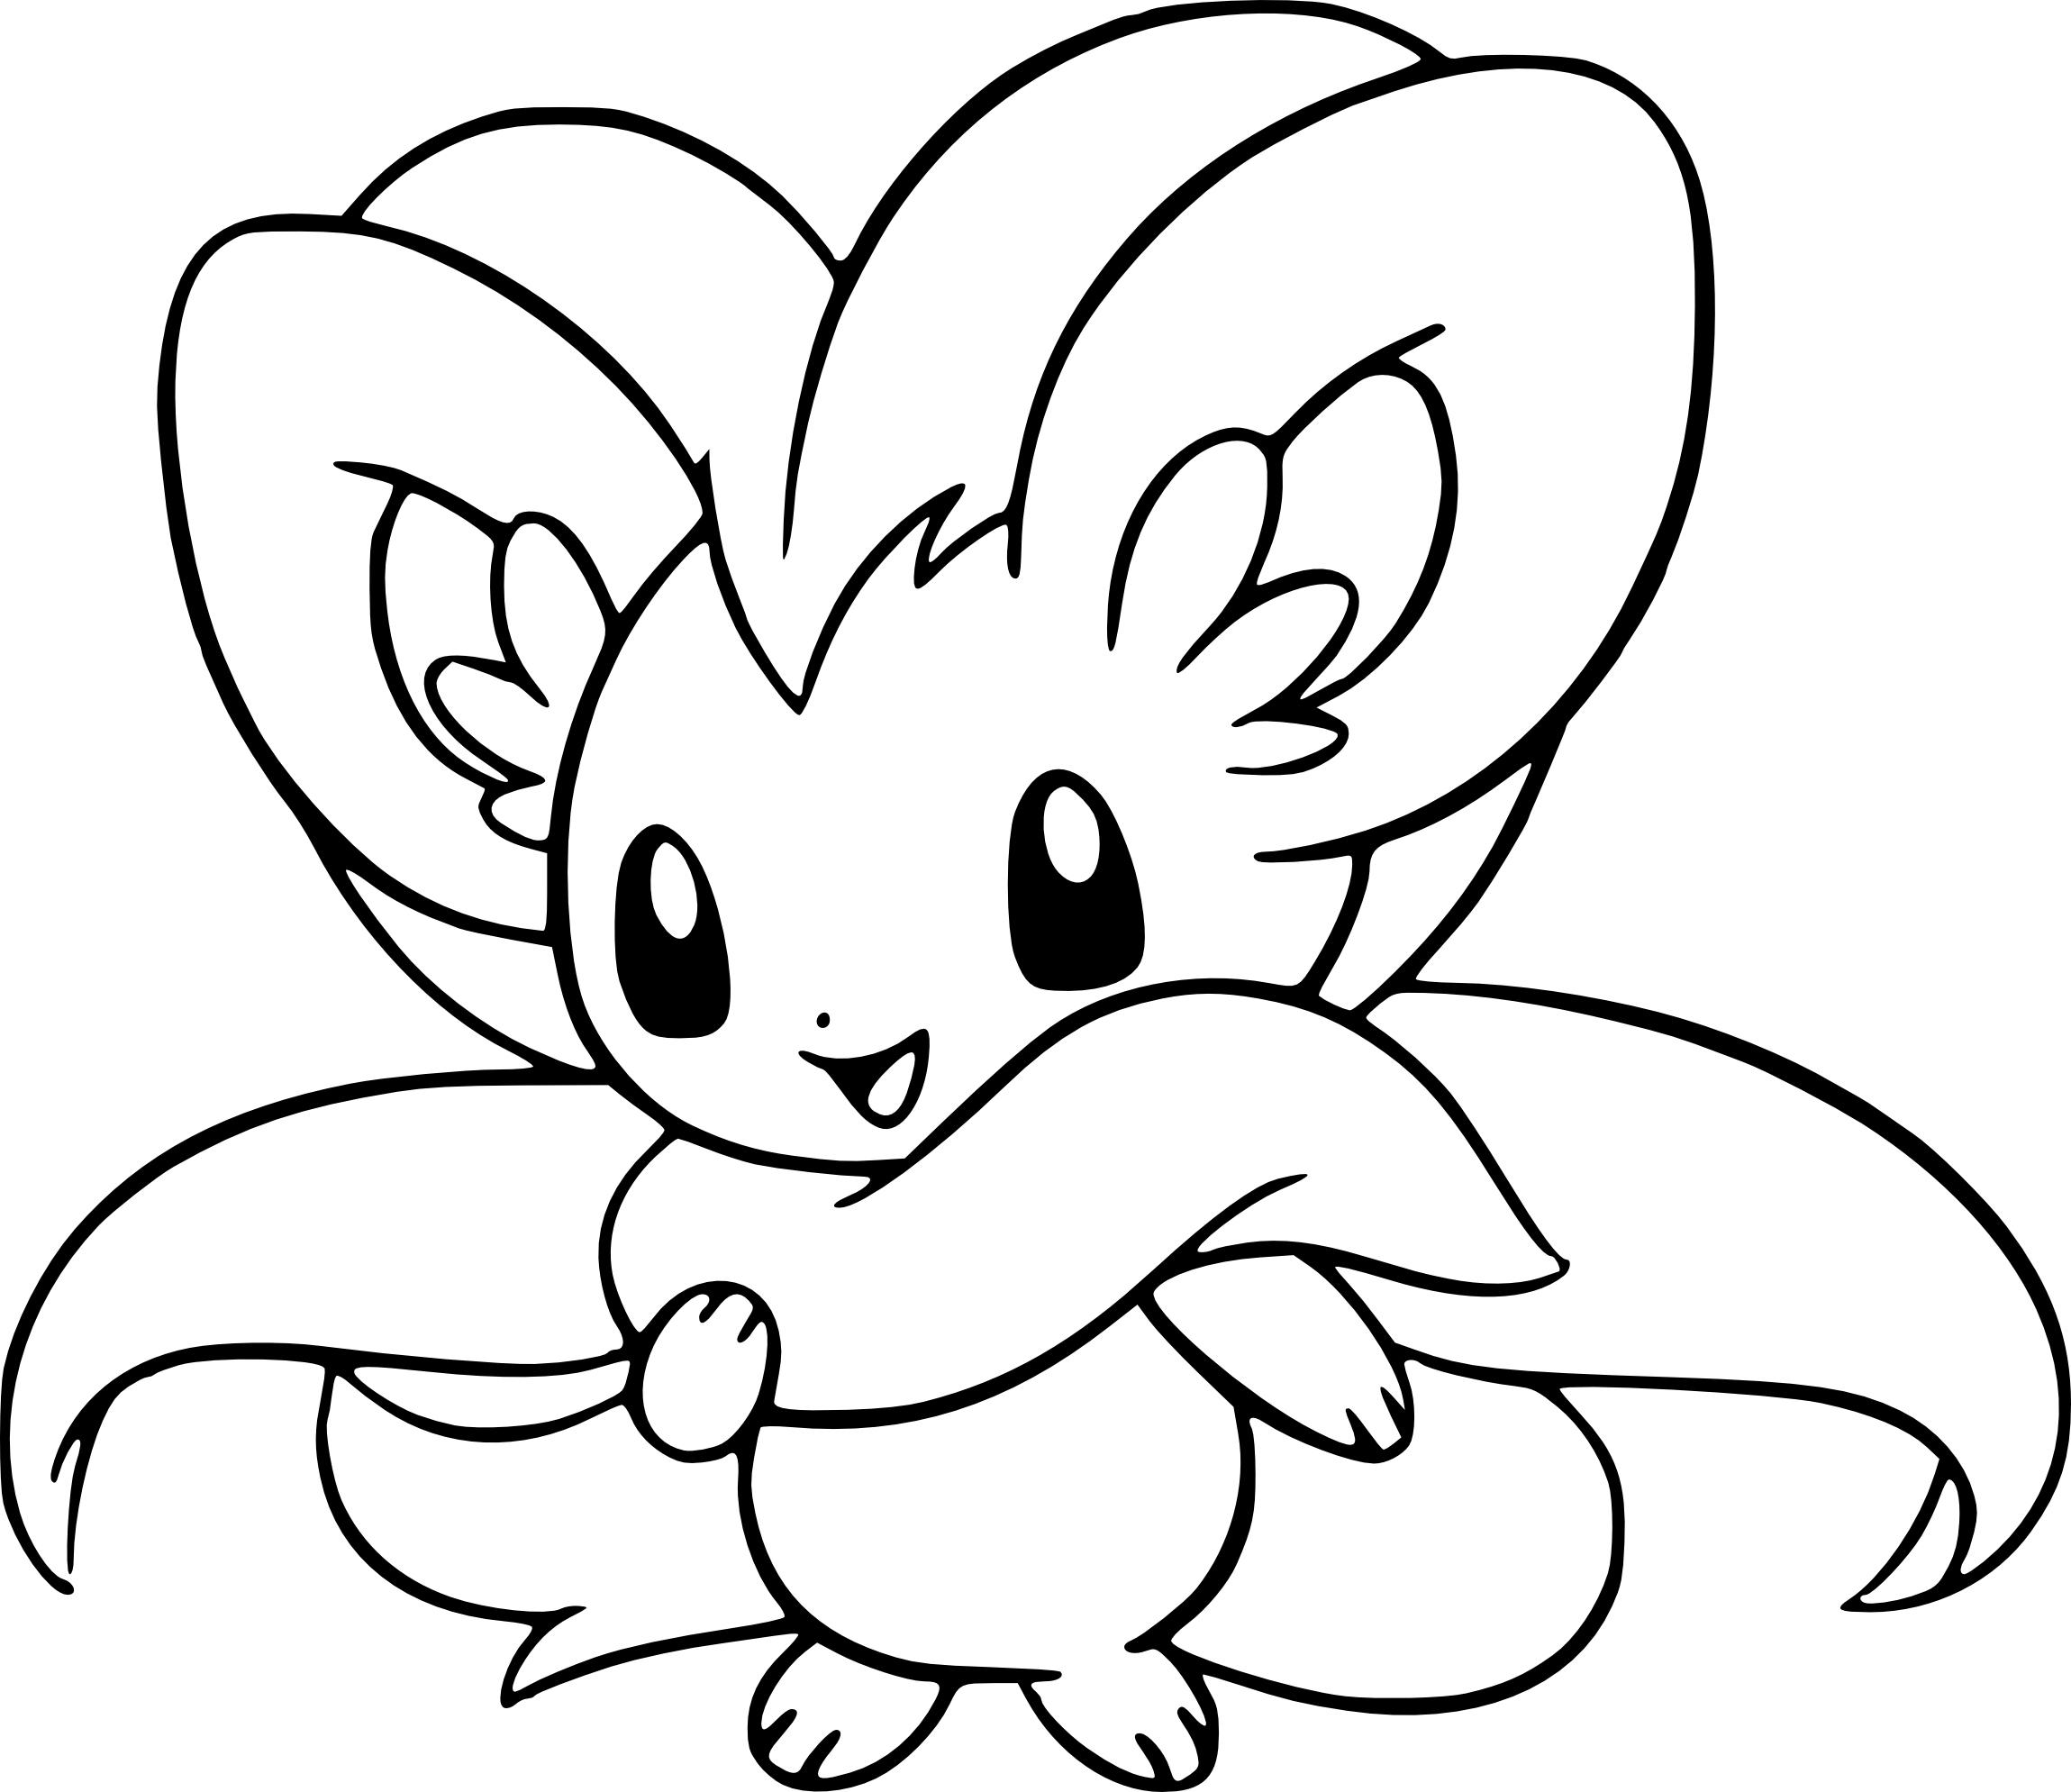 Coloriage Pashmilla Pokemon À Imprimer serapportantà Coloriage Pokemon A Imprimer